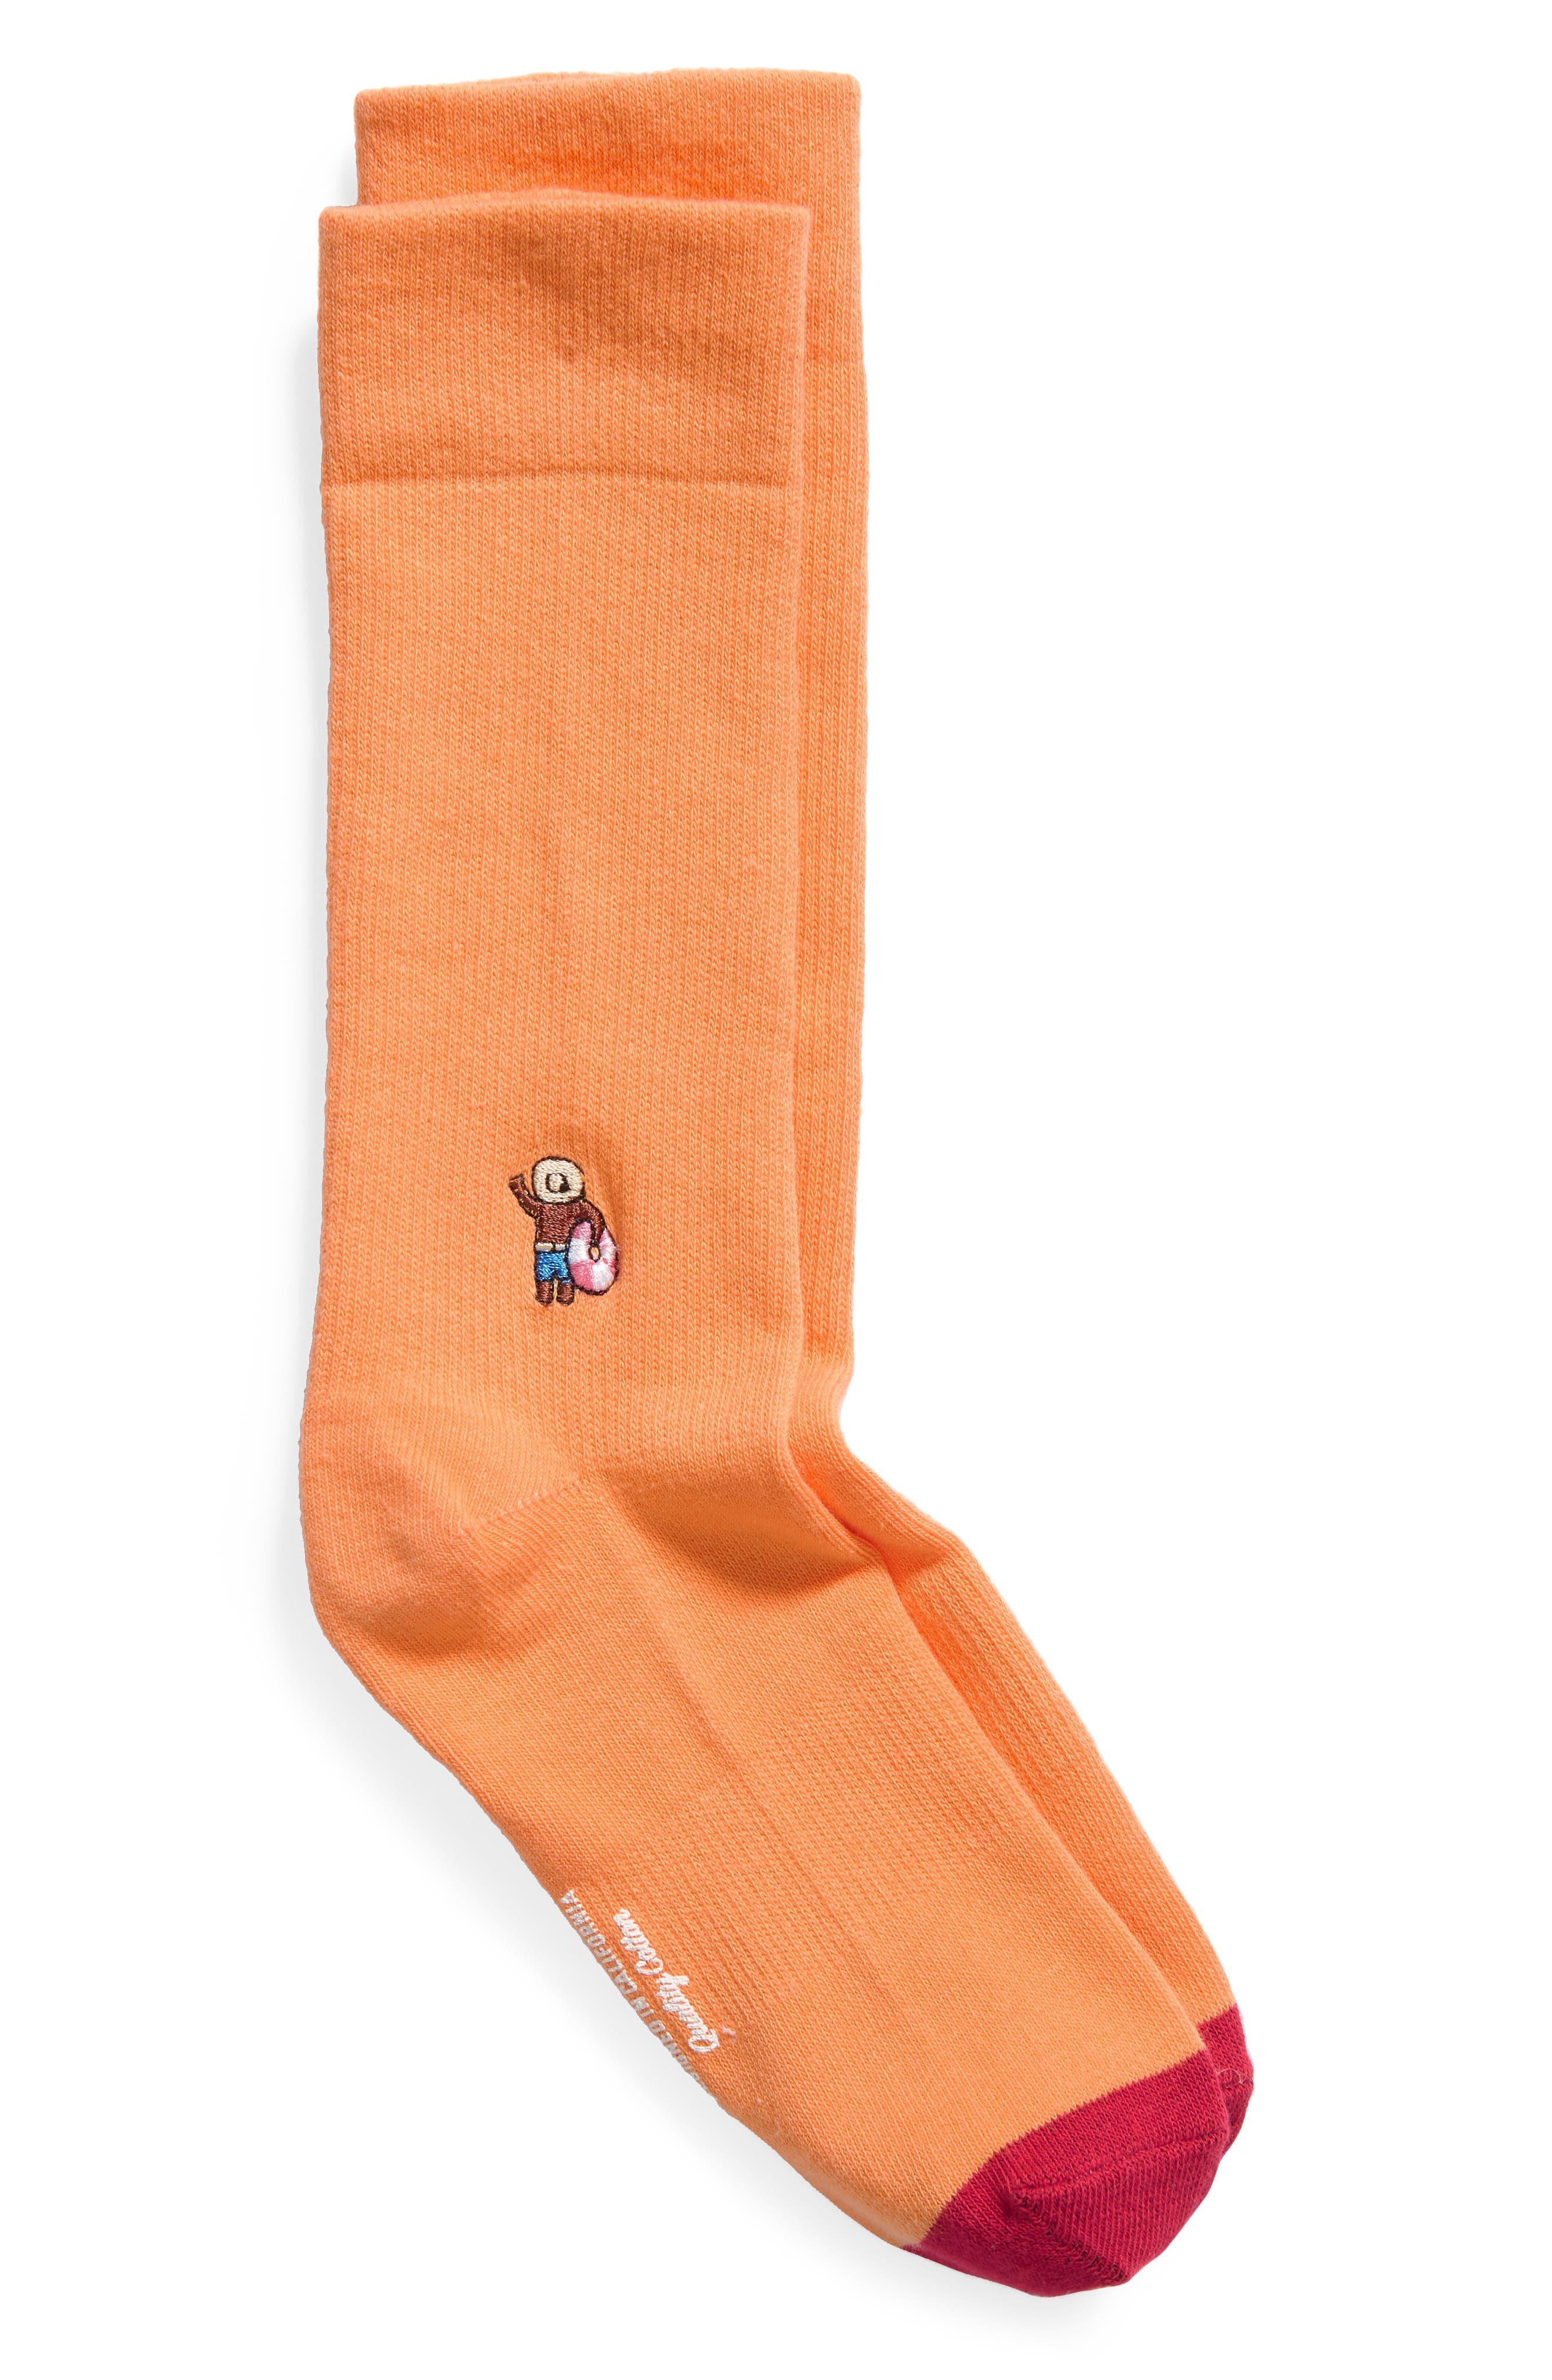 Dude Everyday Crew Socks,                         Main,                         color, ORANGE